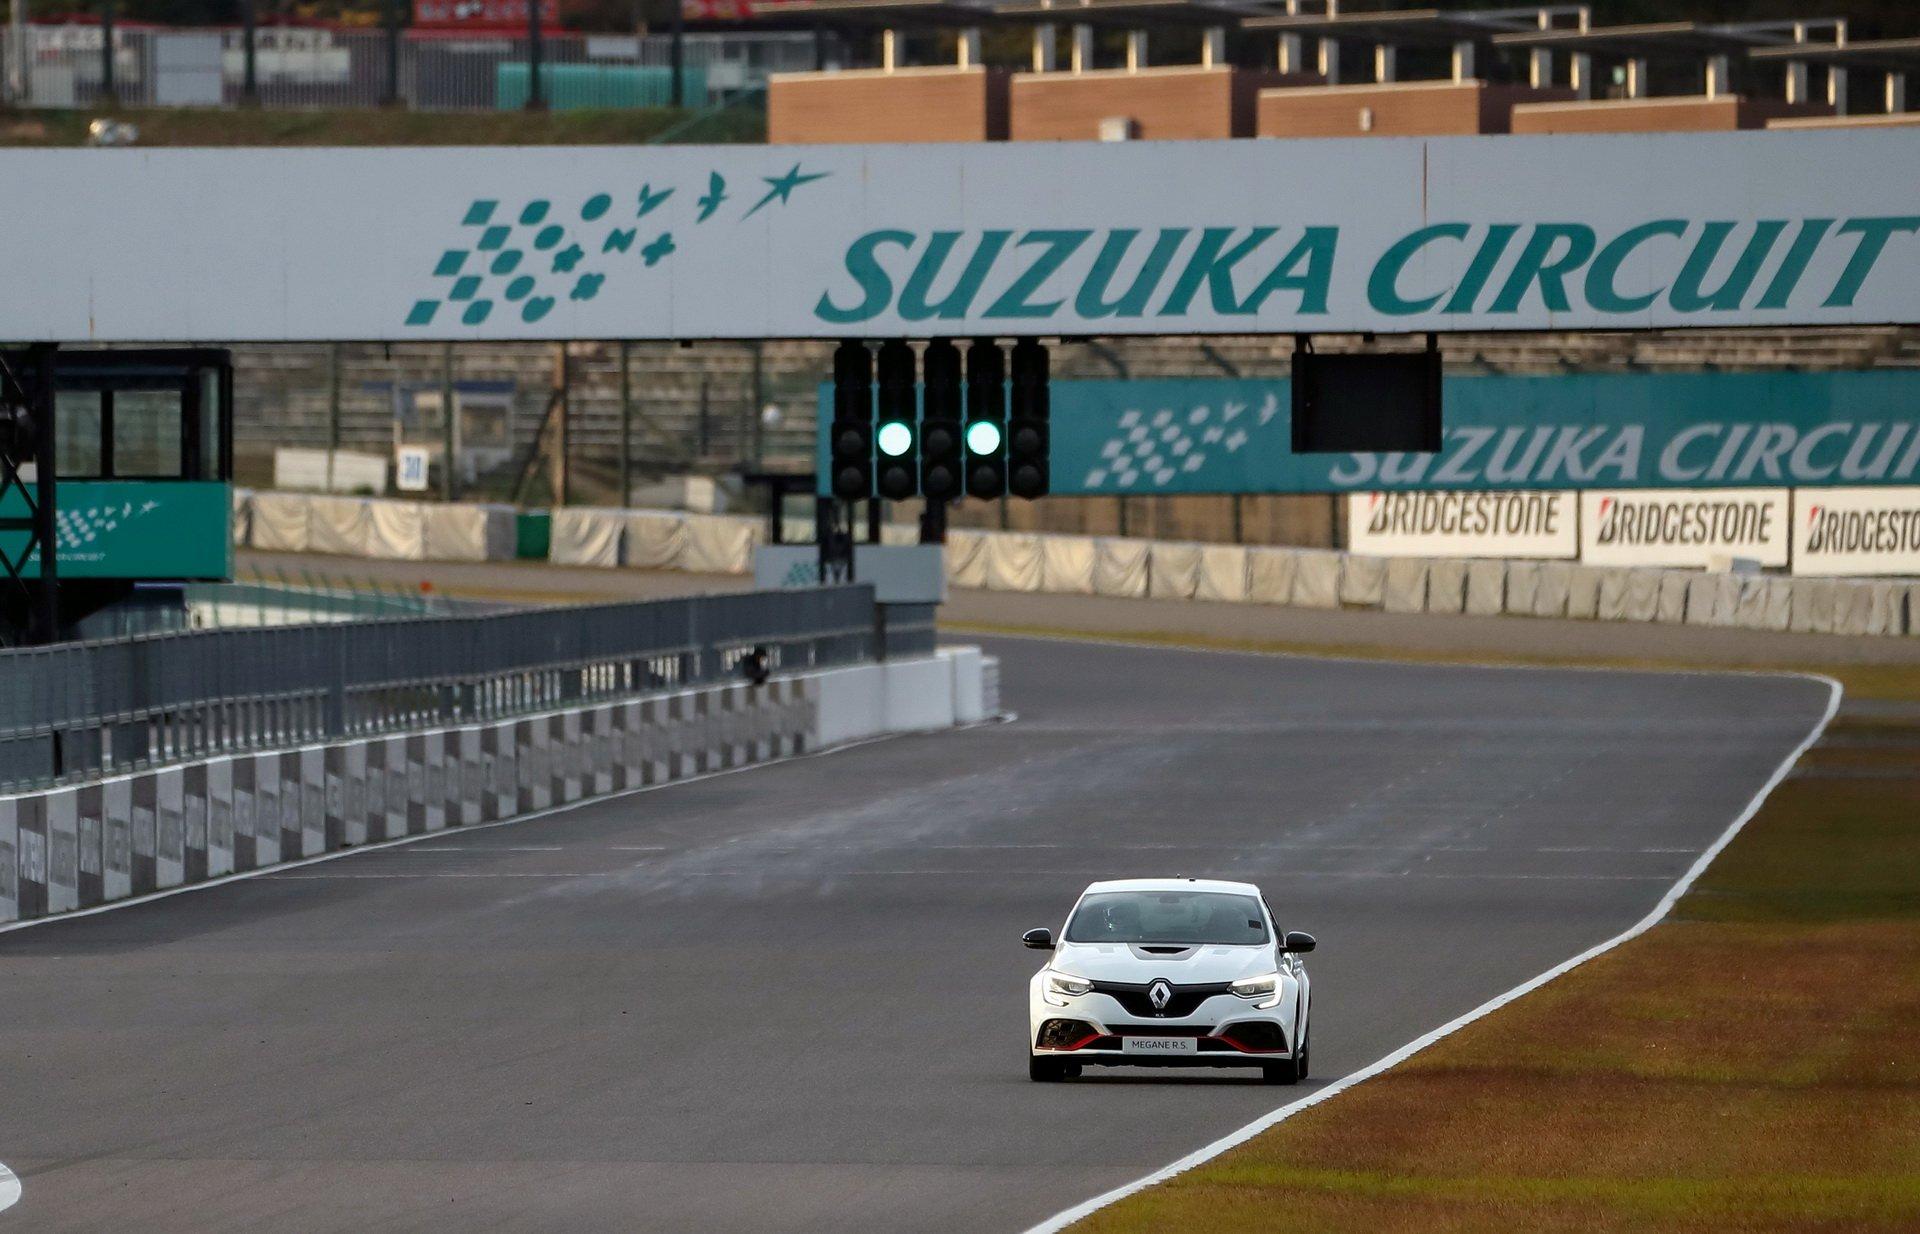 2020 Renault Megane Rs Trophy R Suzuka Record 2